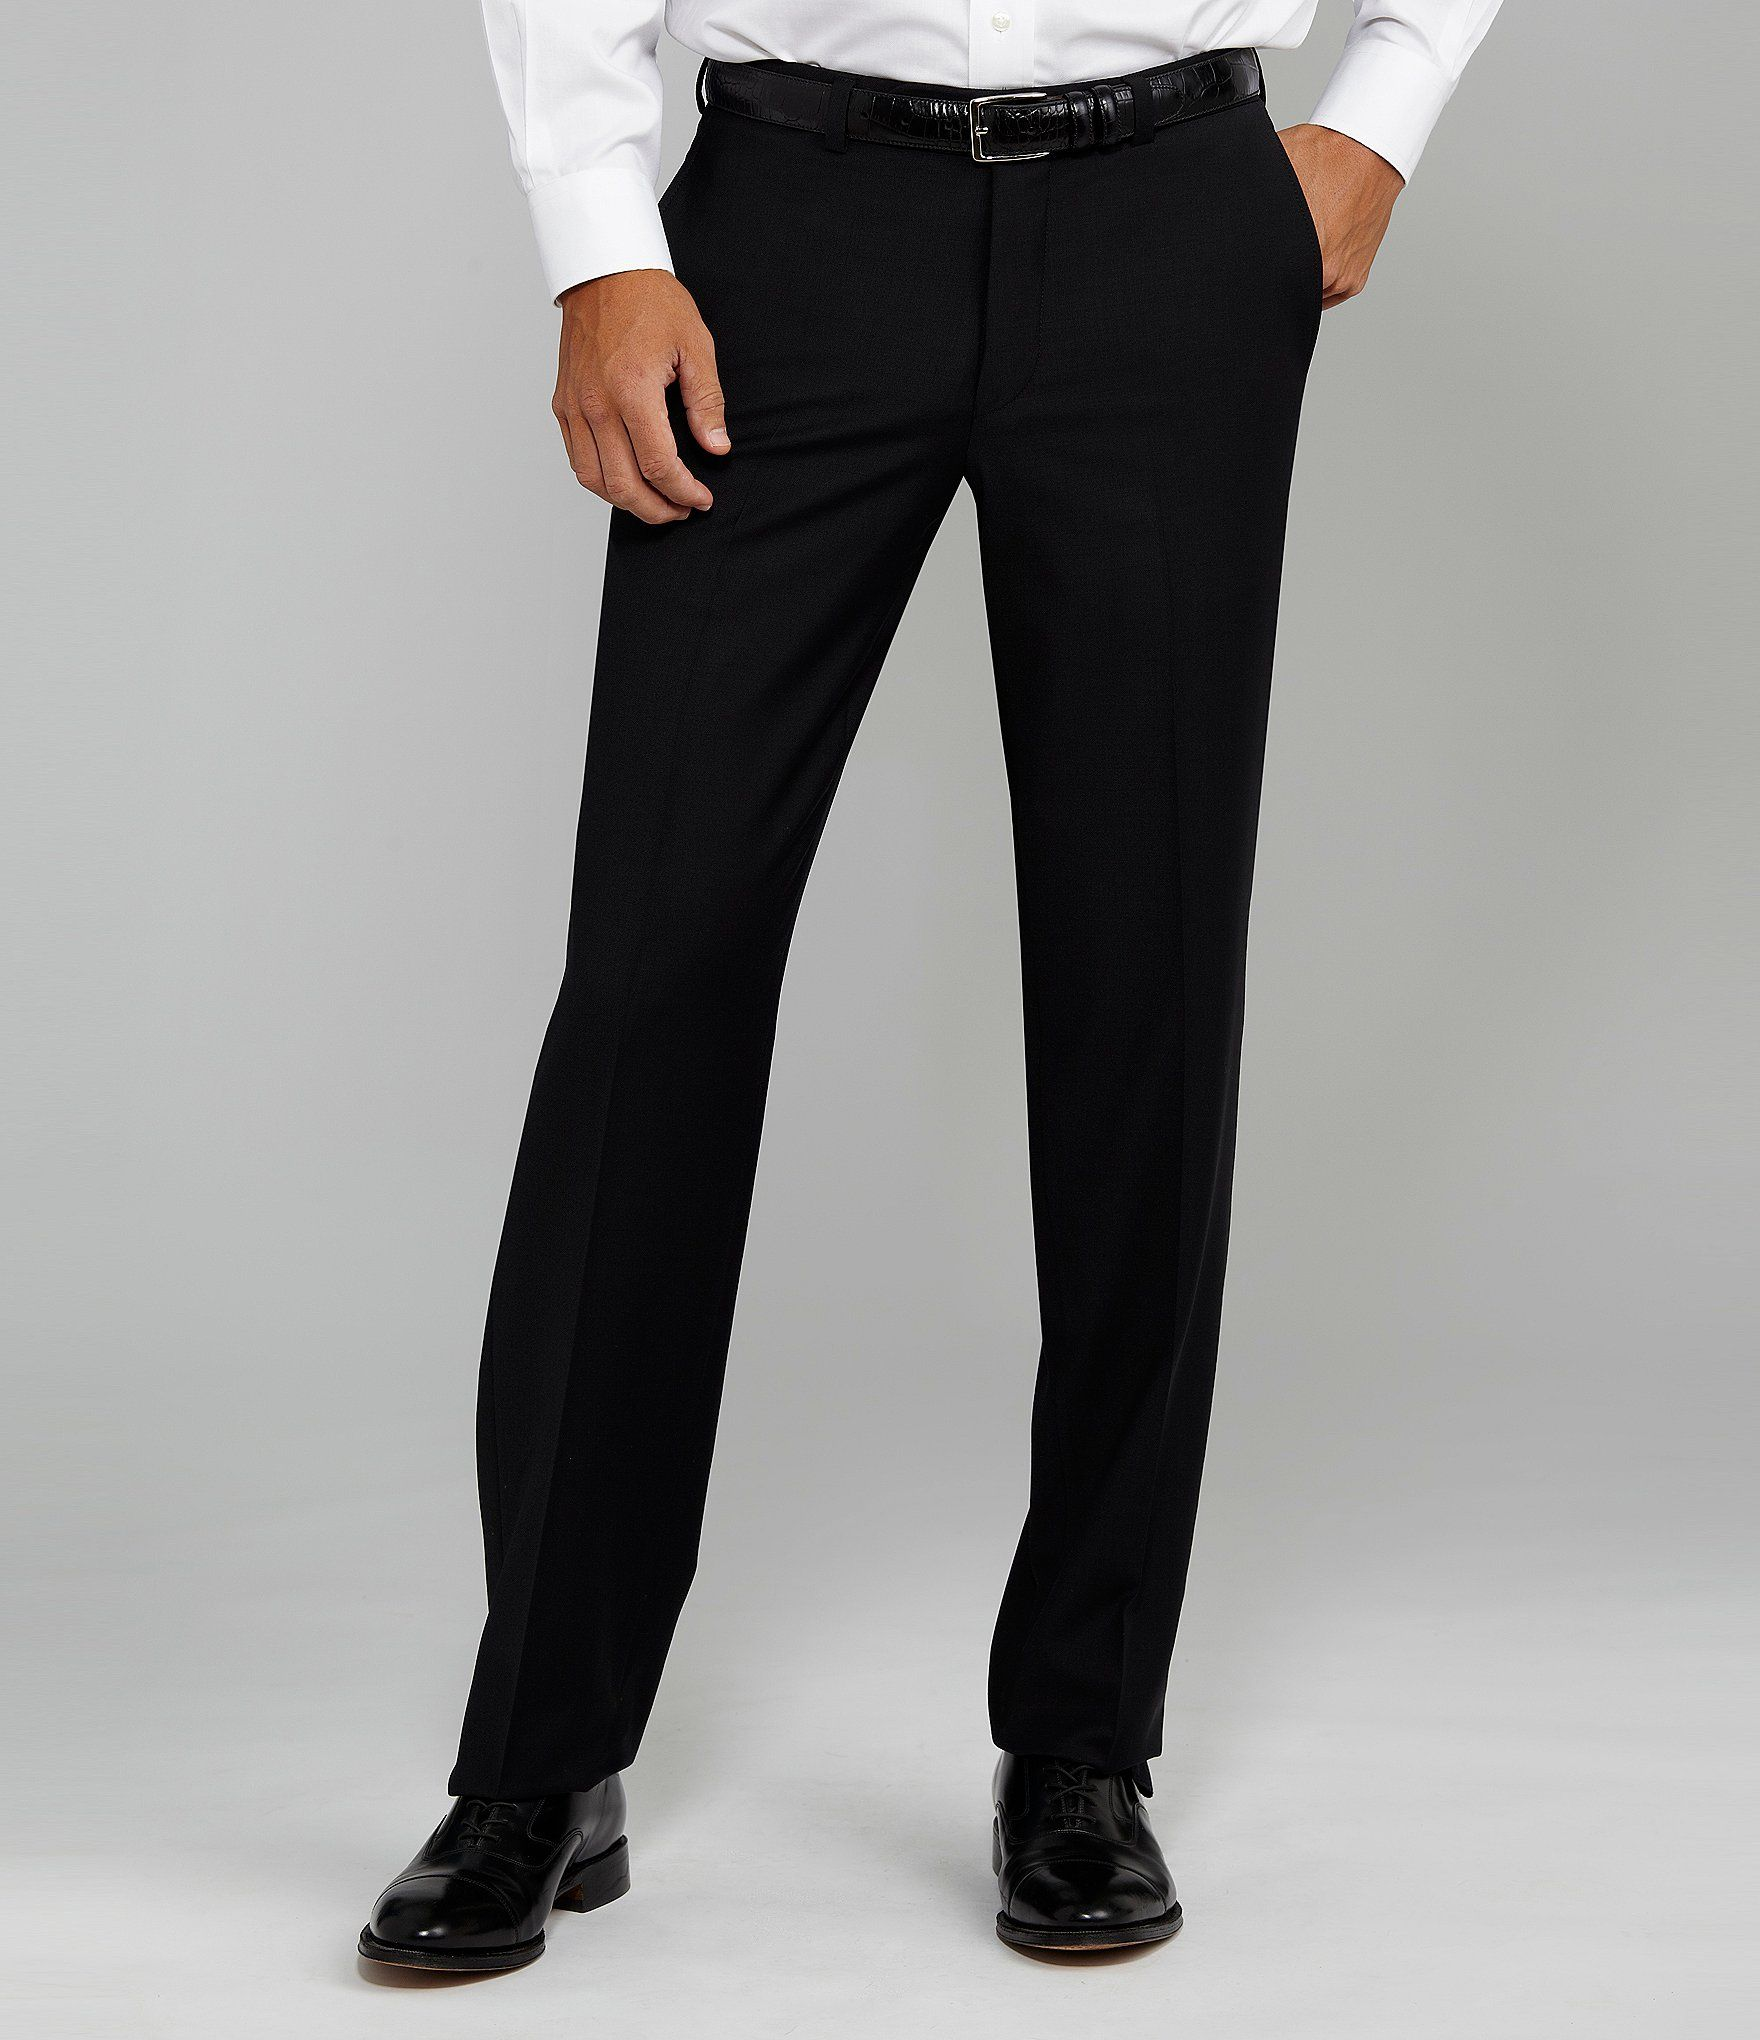 Cremieux Flat Front Modern Fit Travel Smart Dress Pants Dillard S Smart Dress Black Dress Pants Black Dress Pants Outfits [ 2040 x 1760 Pixel ]